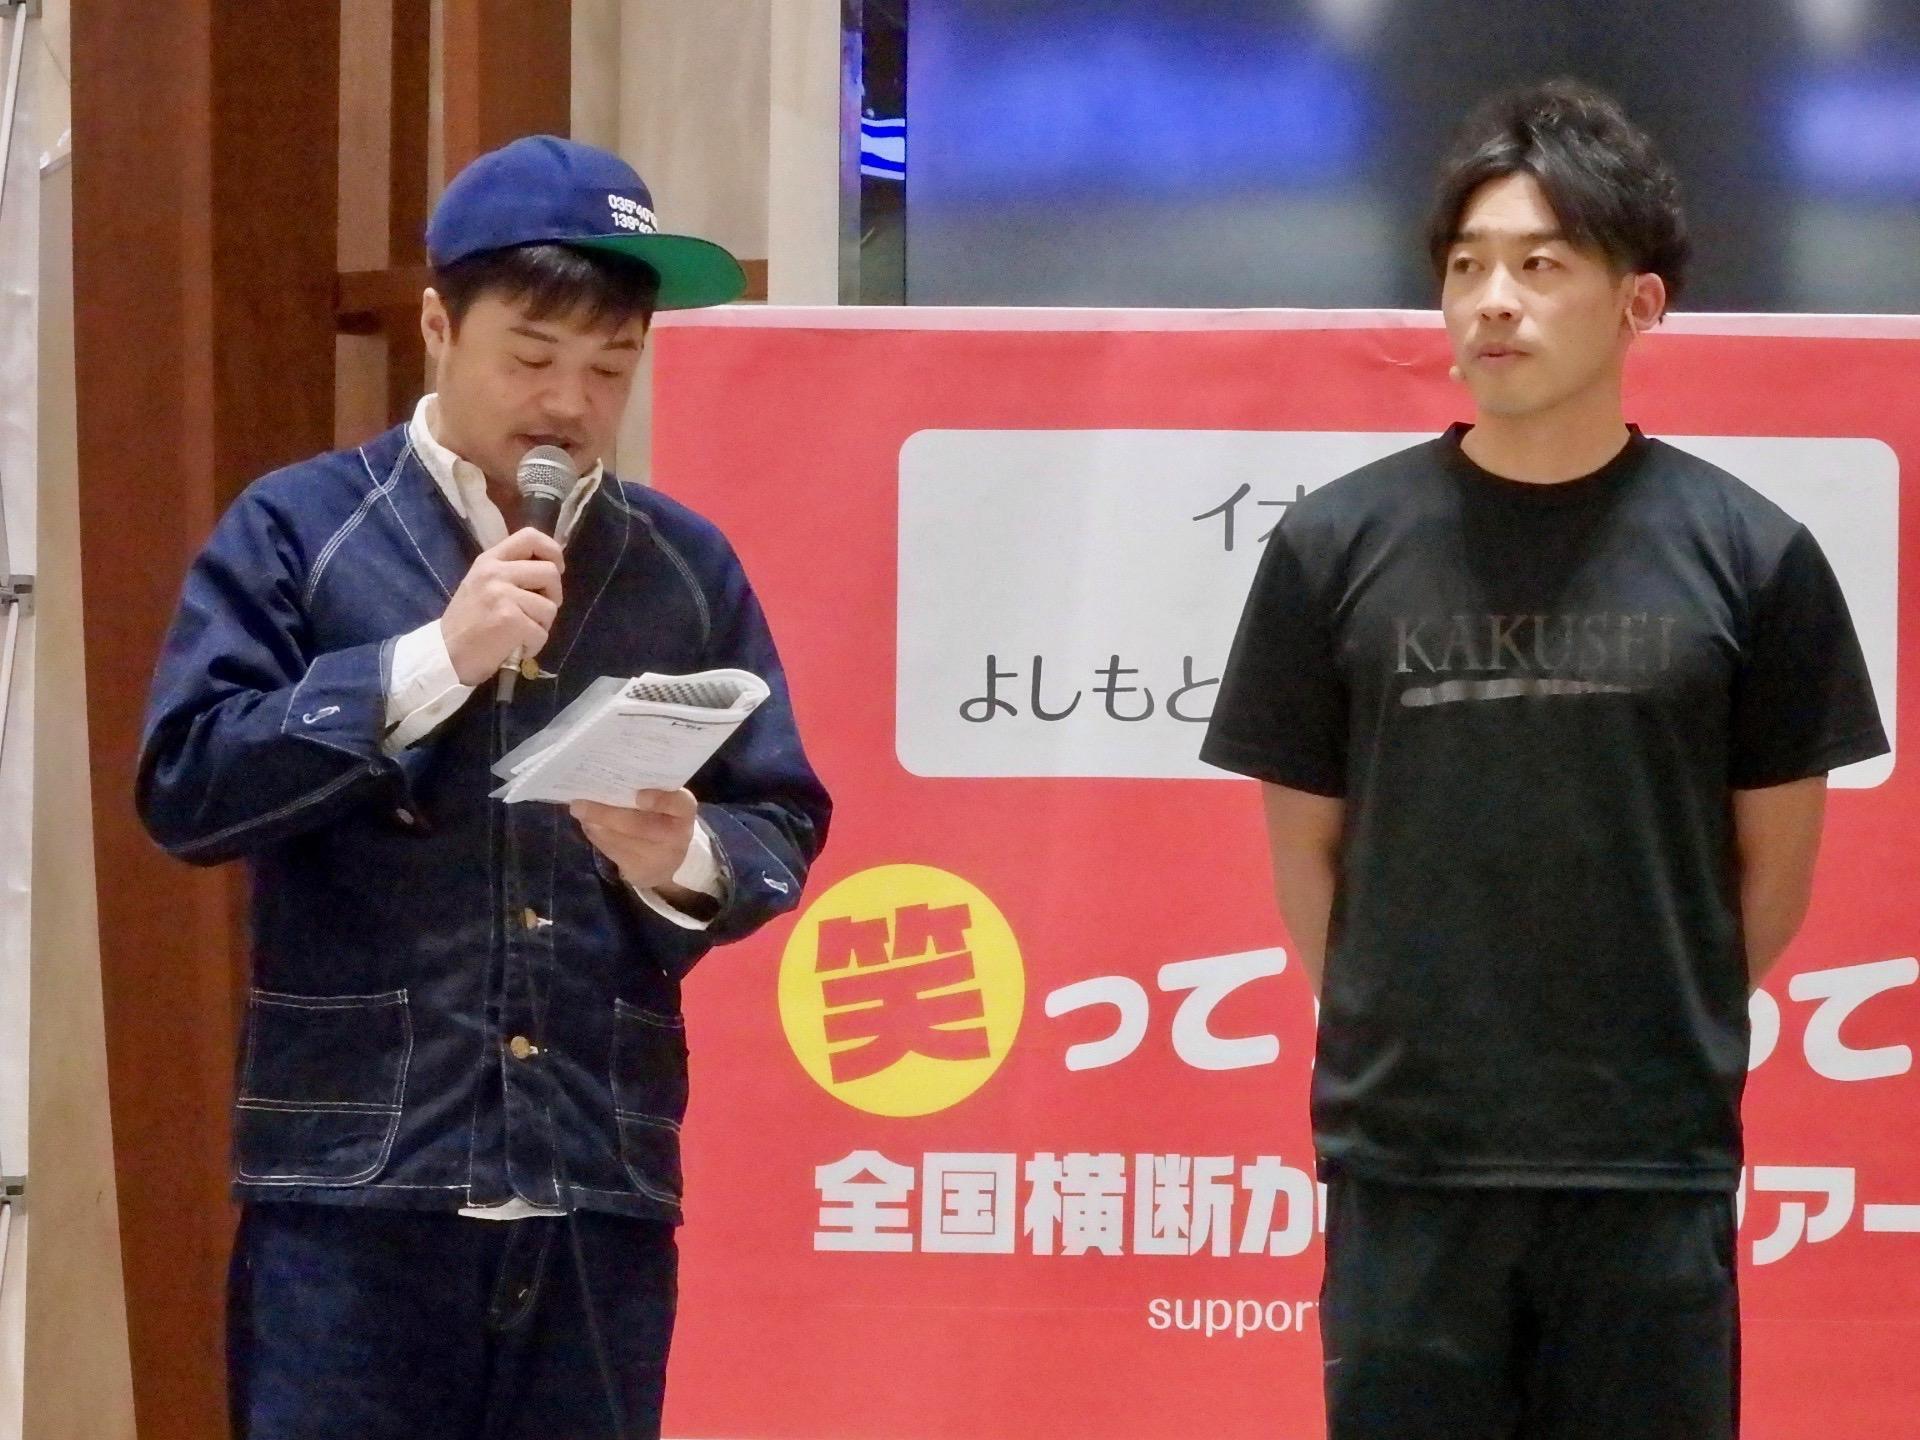 http://news.yoshimoto.co.jp/20180211194611-521d75f47e49f471ec6d561e527829686e877cff.jpg